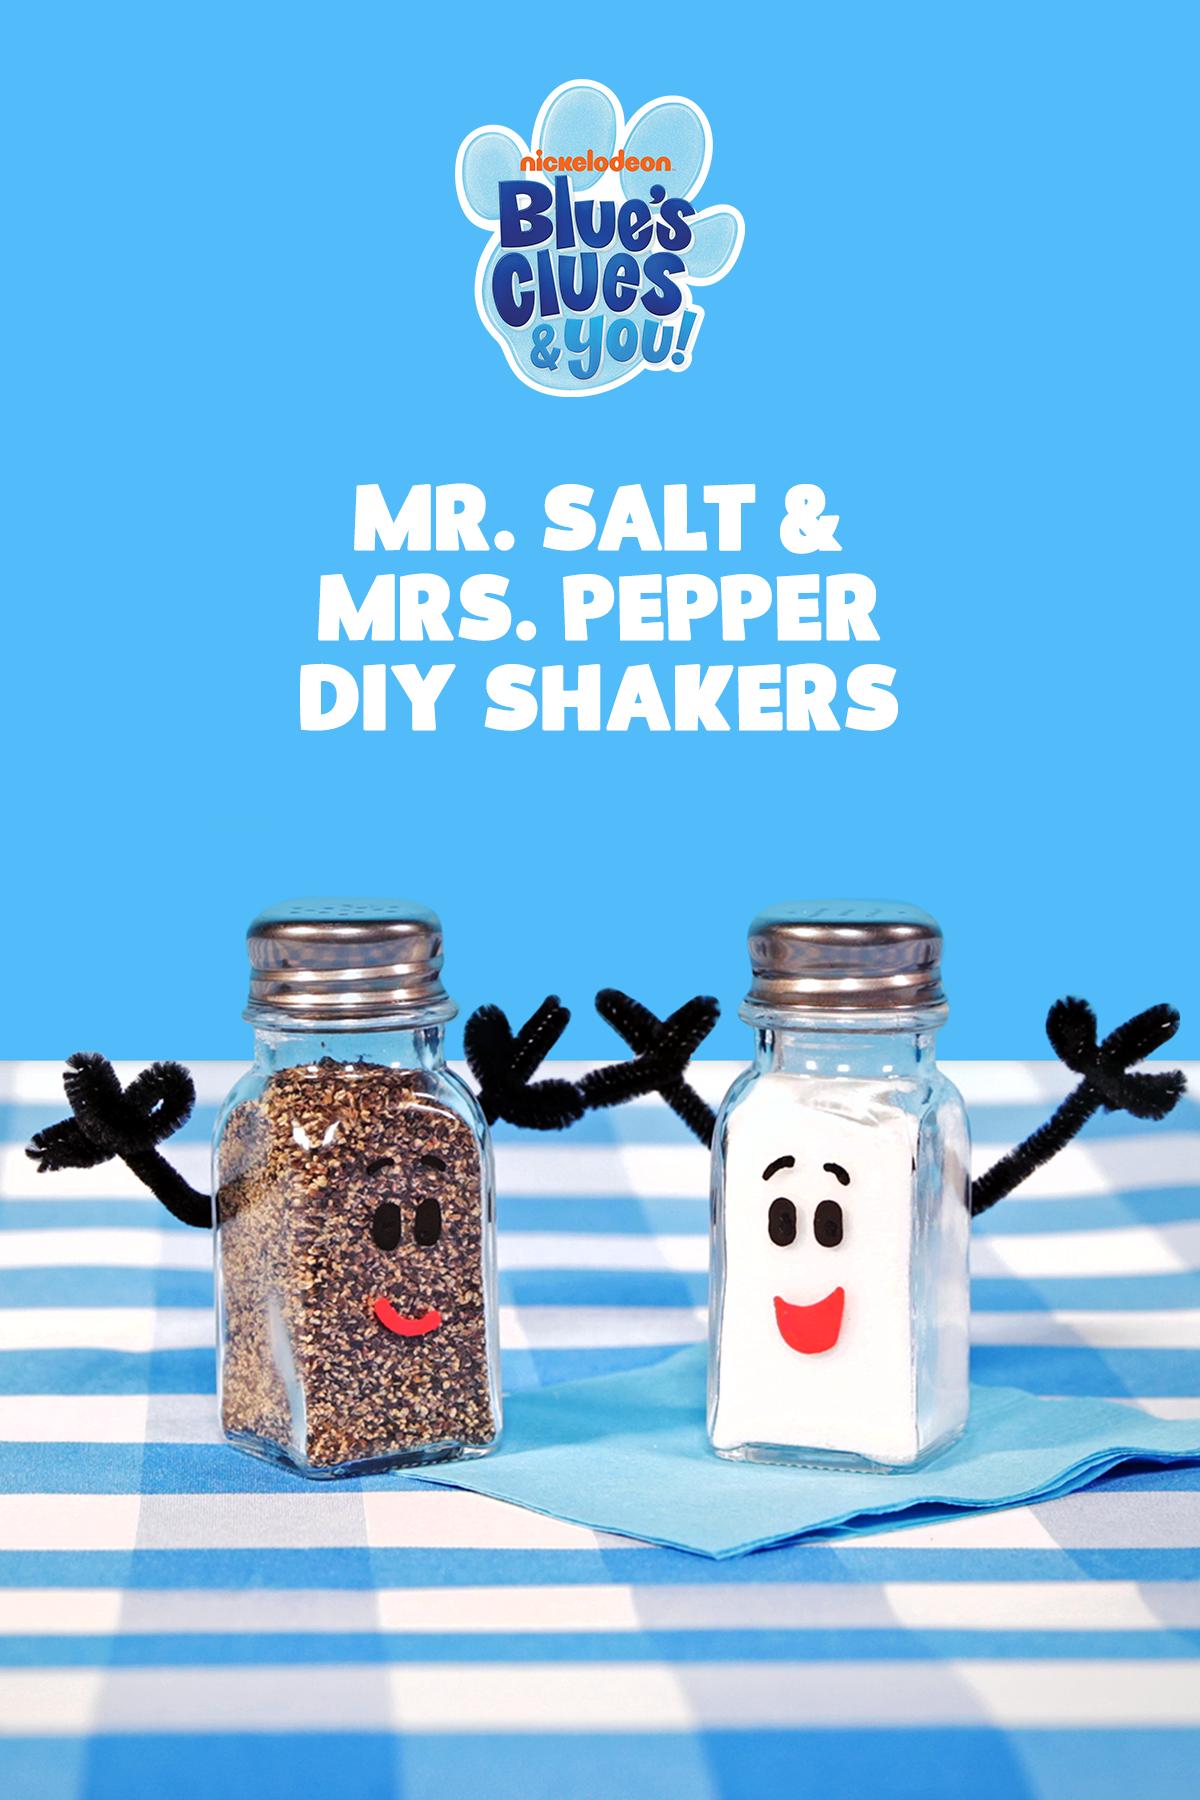 Mr. Salt & Mrs. Pepper DIY